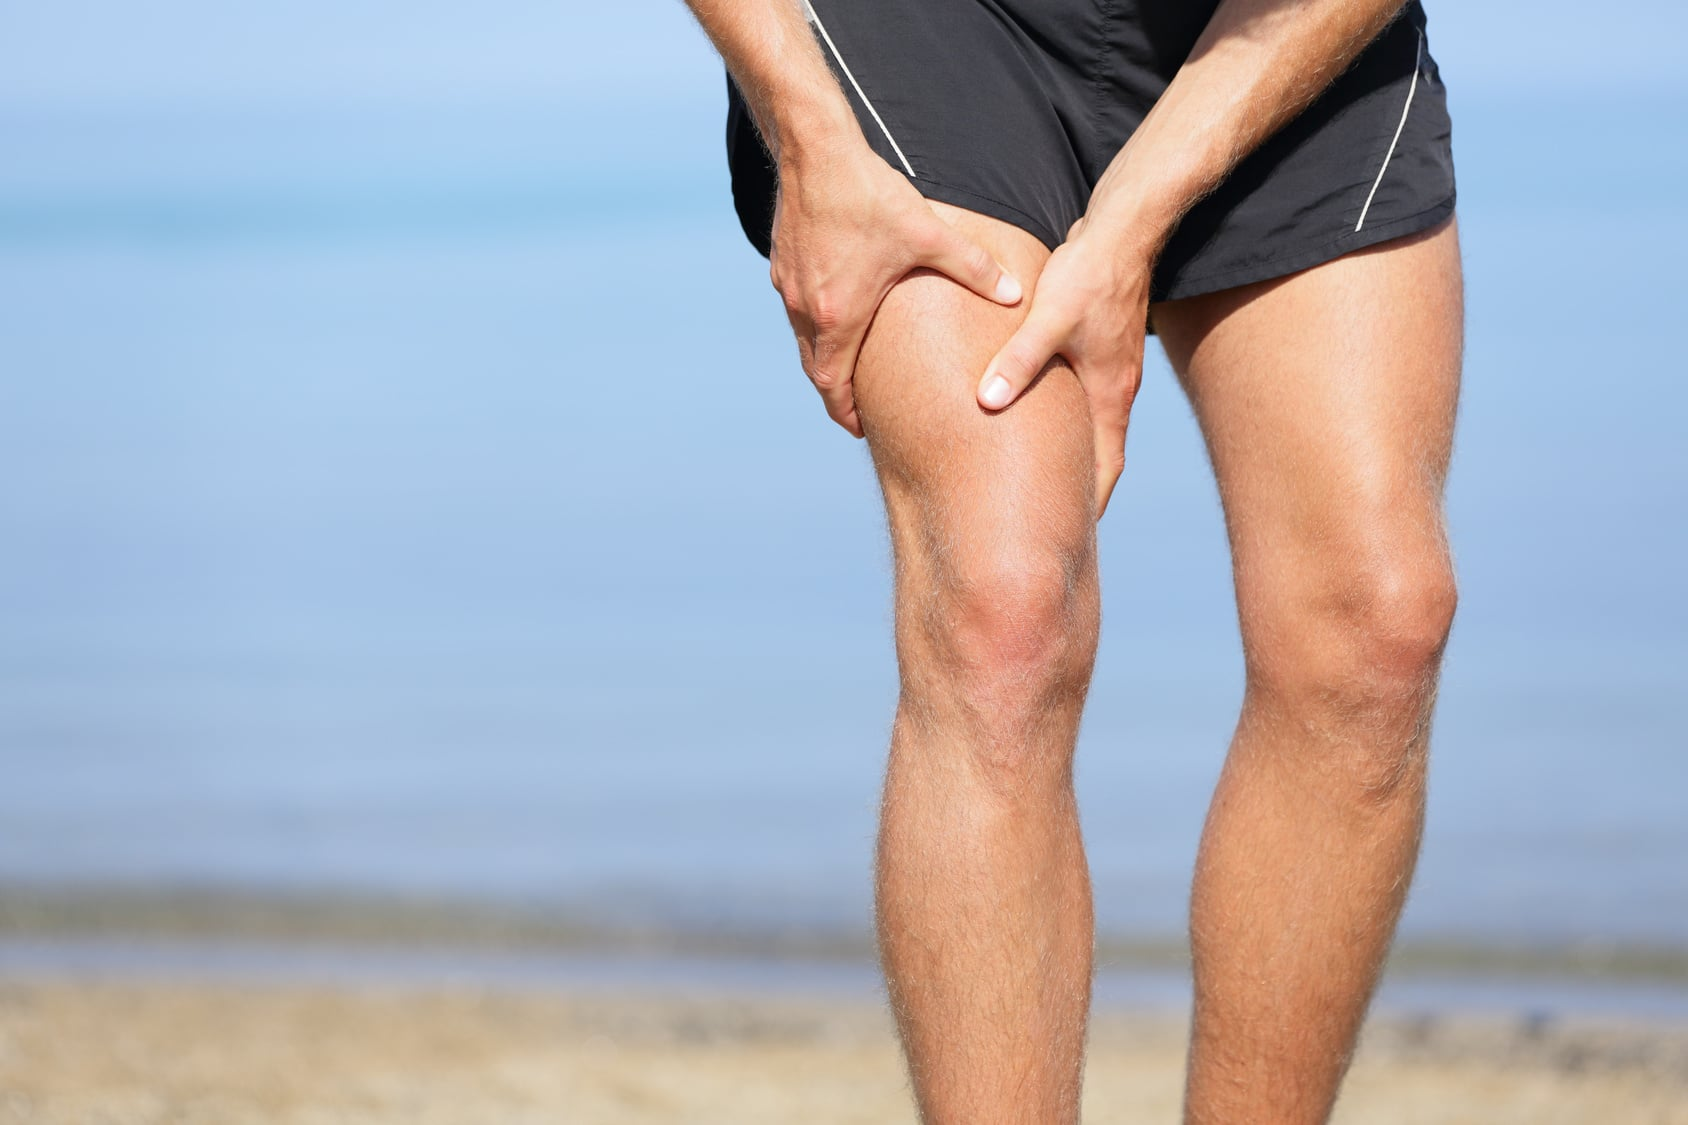 runner suffering from injury